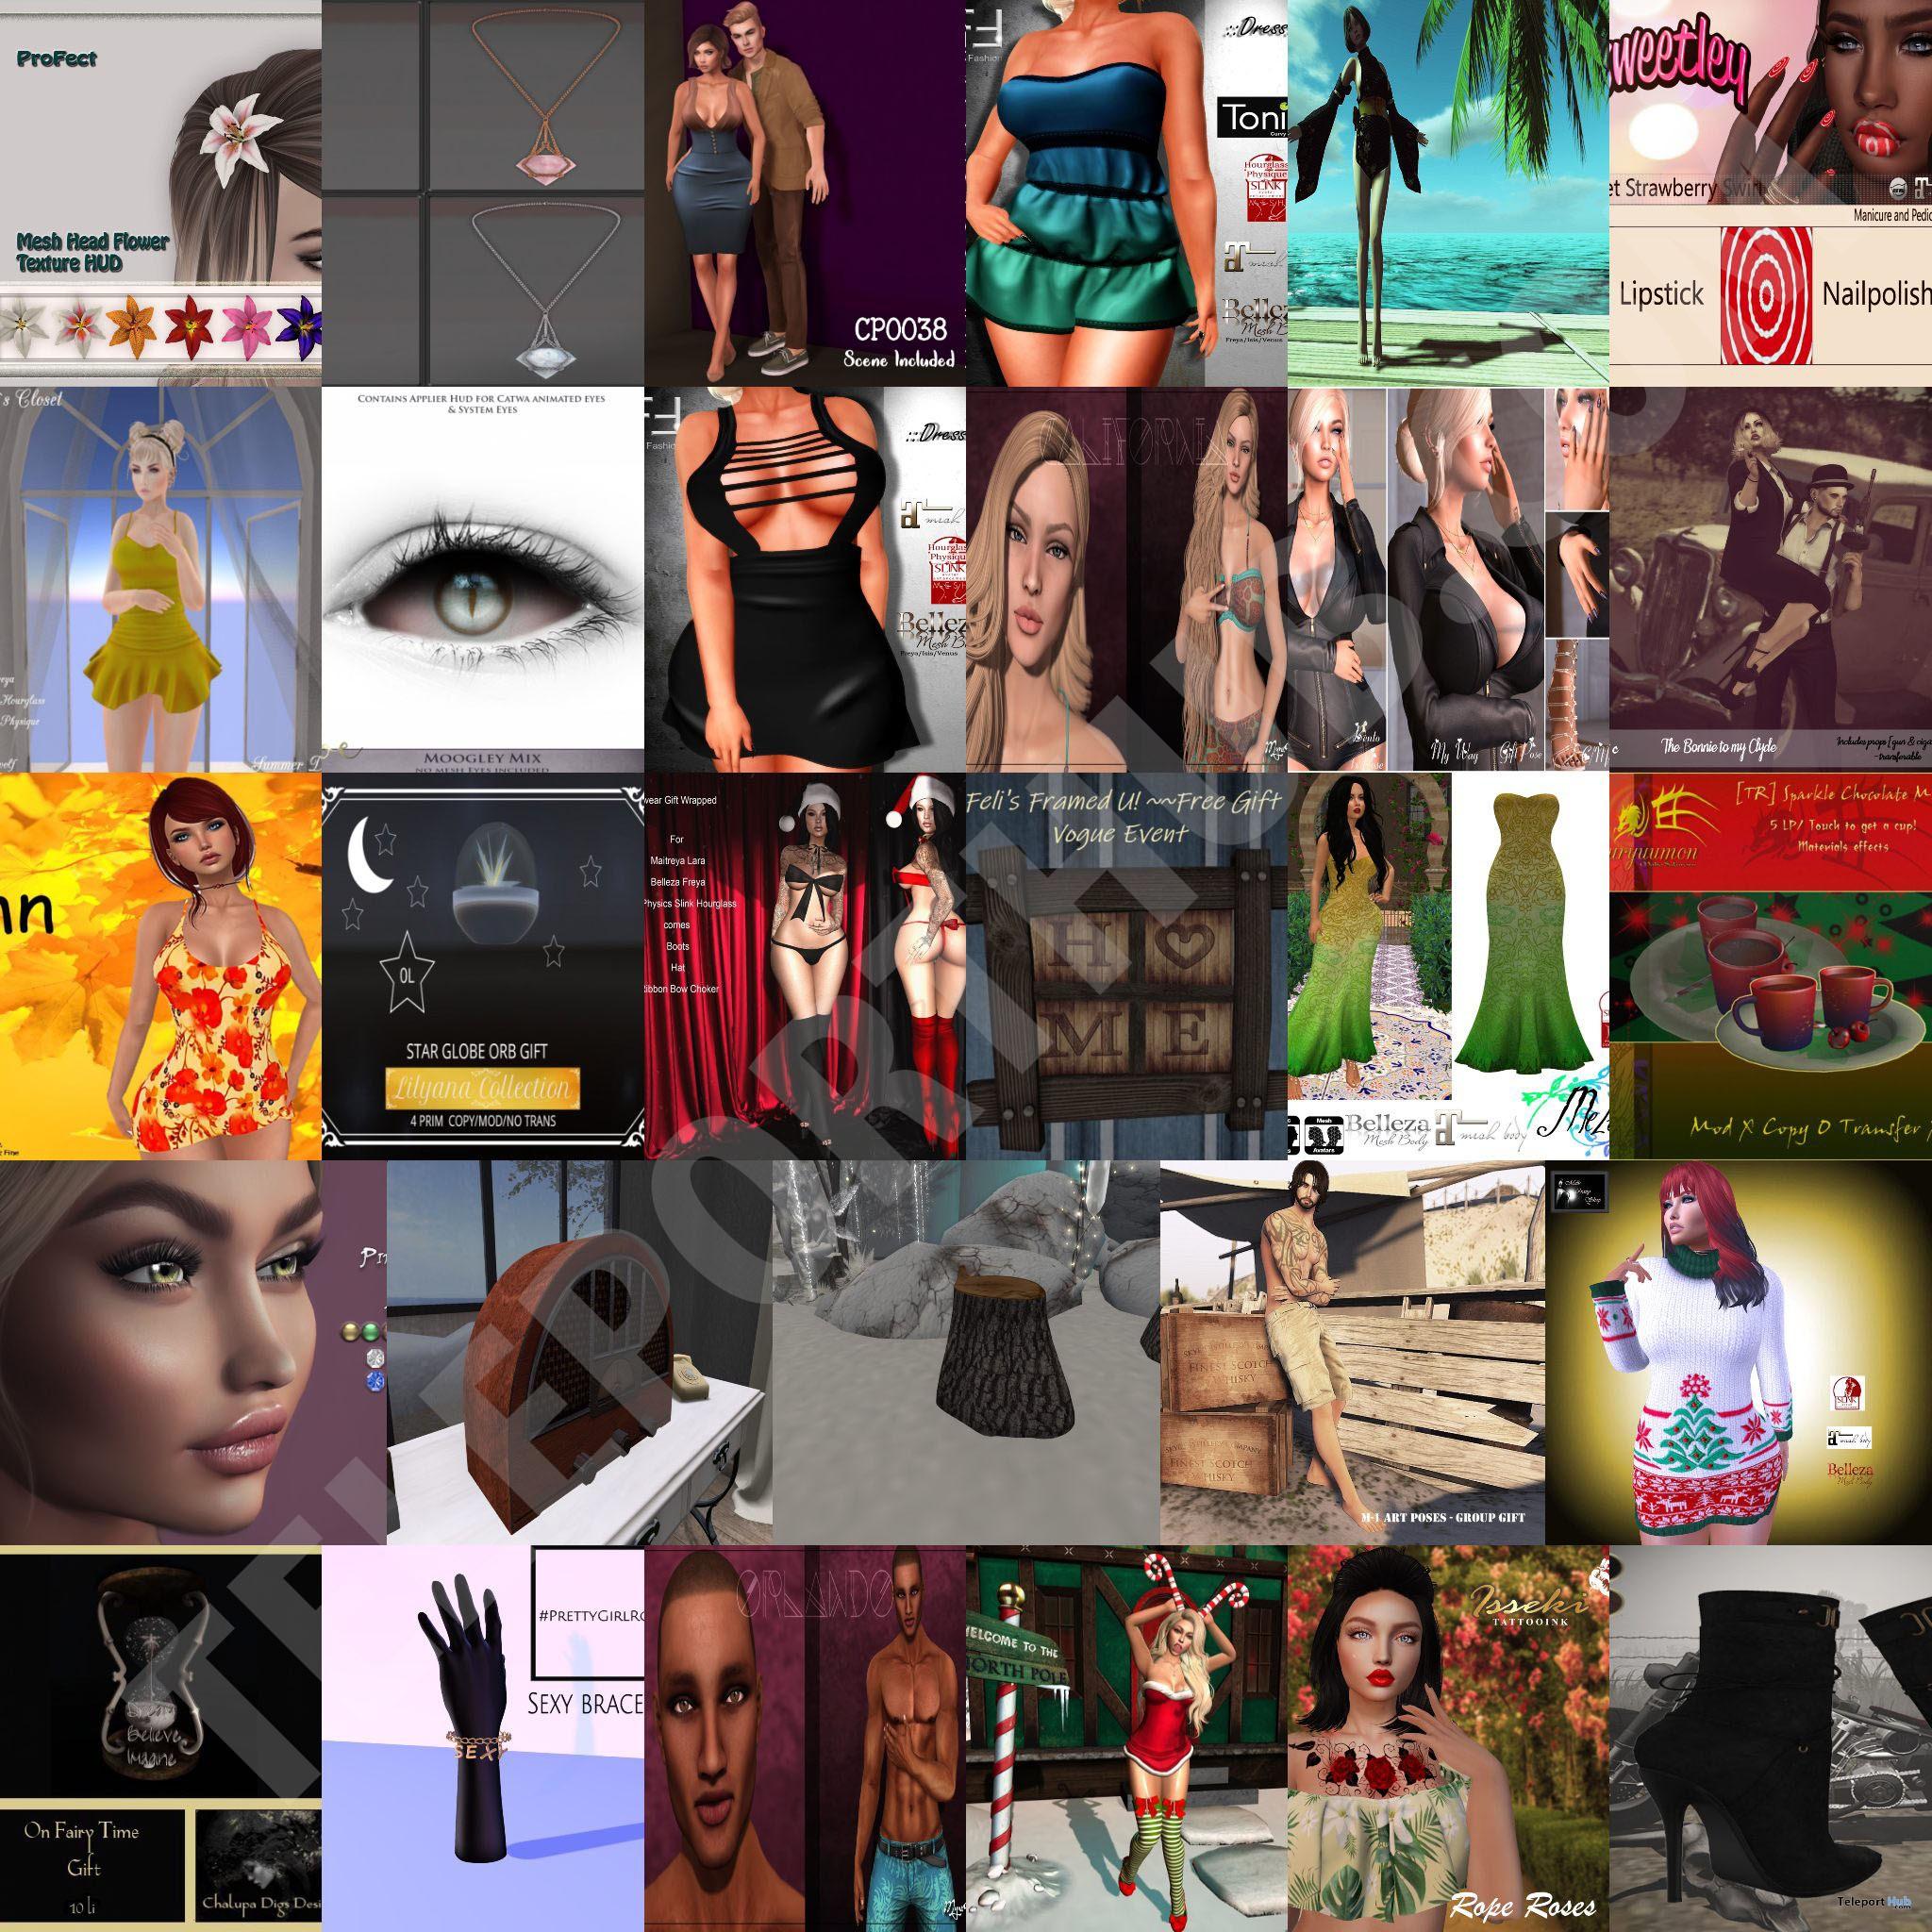 Several Gifts @ The Original Vogue Event November 2018 by Various Designers - Teleport Hub - teleporthub.com